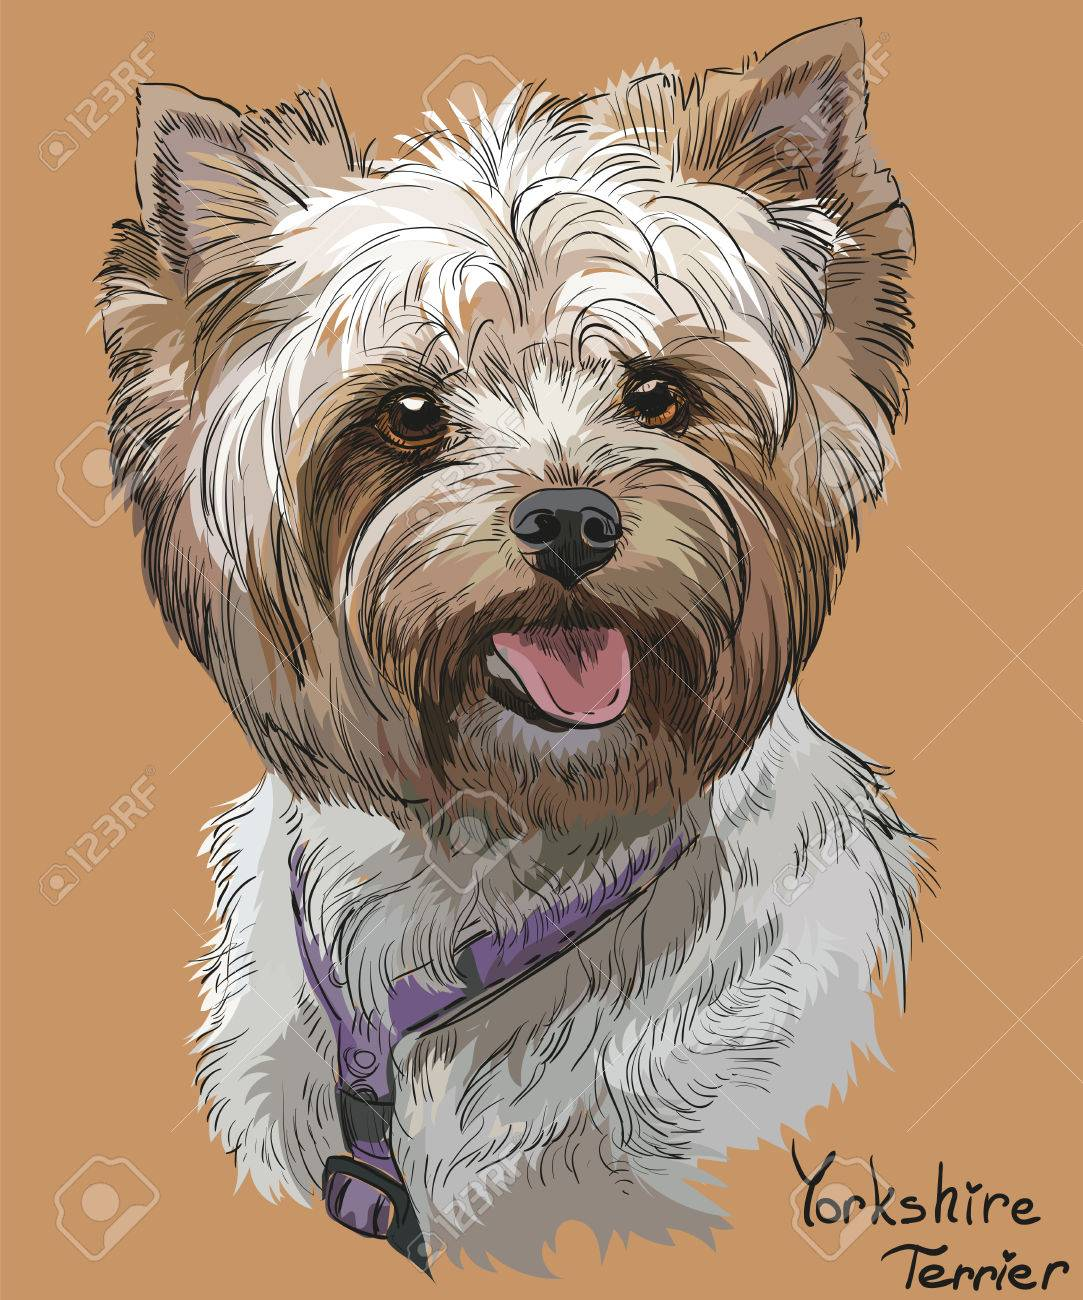 1083x1300 Vector Portrait Of Yorkshire Terrier In Diferent Color Hand